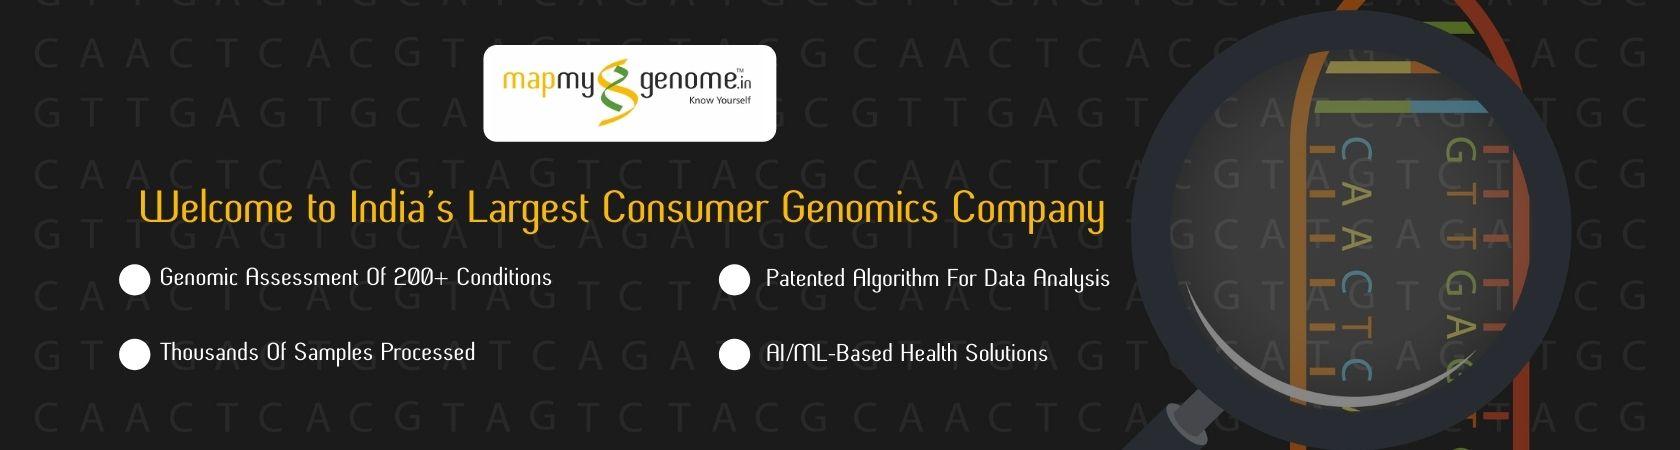 Mapmygenome - Largest Consumer Genomics Company